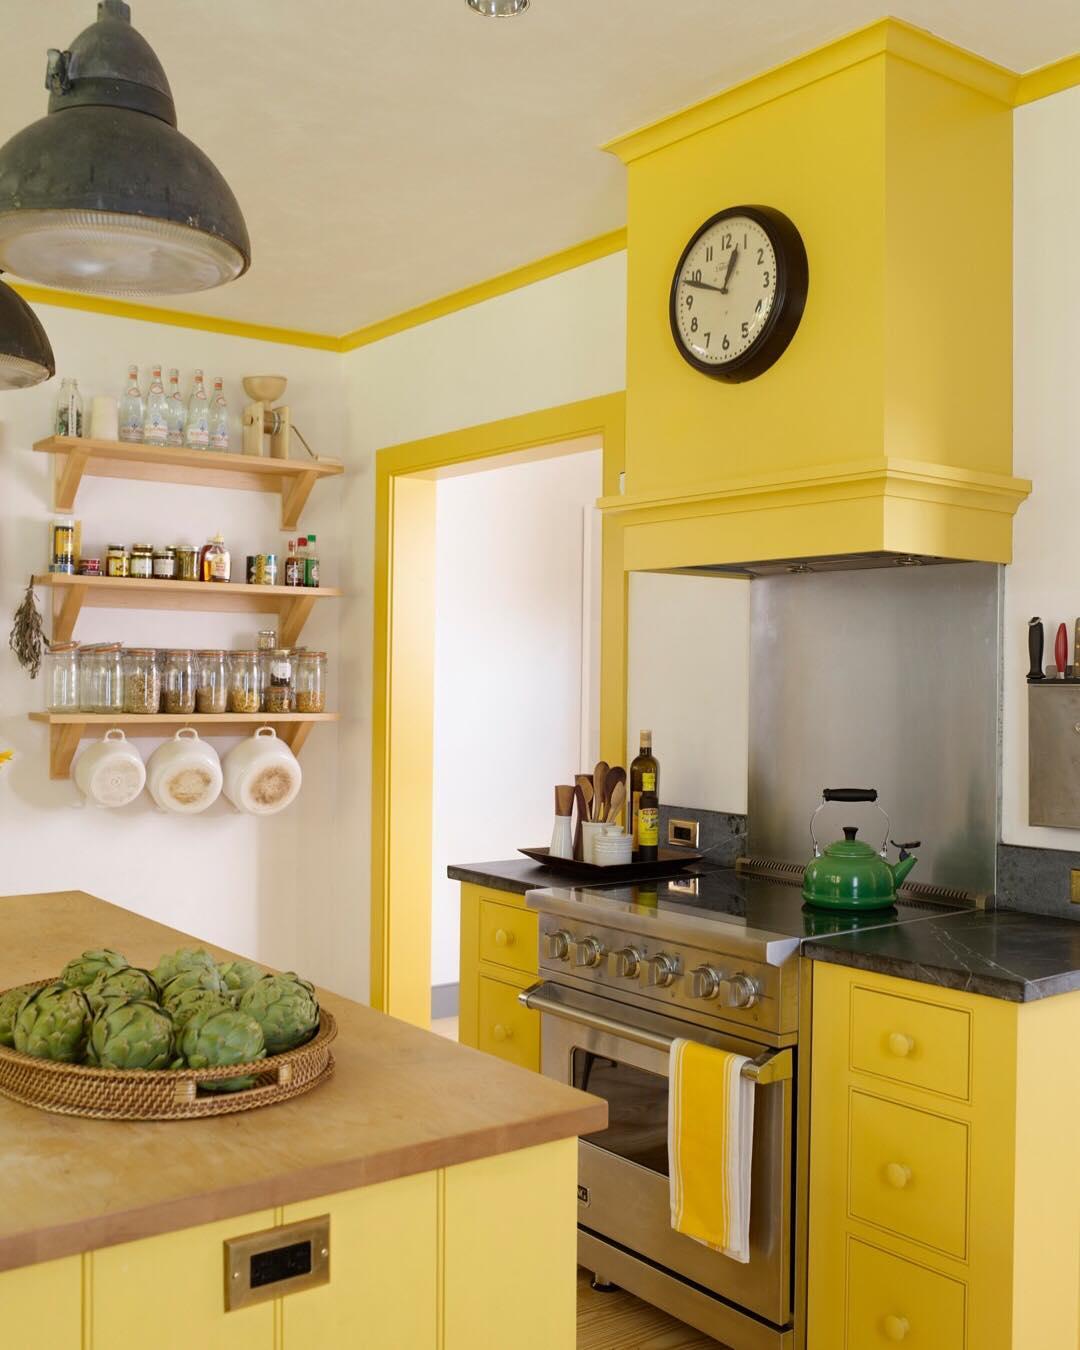 Farrow And Ball Kitchen Cabinets: Farrow & Ball Babouche